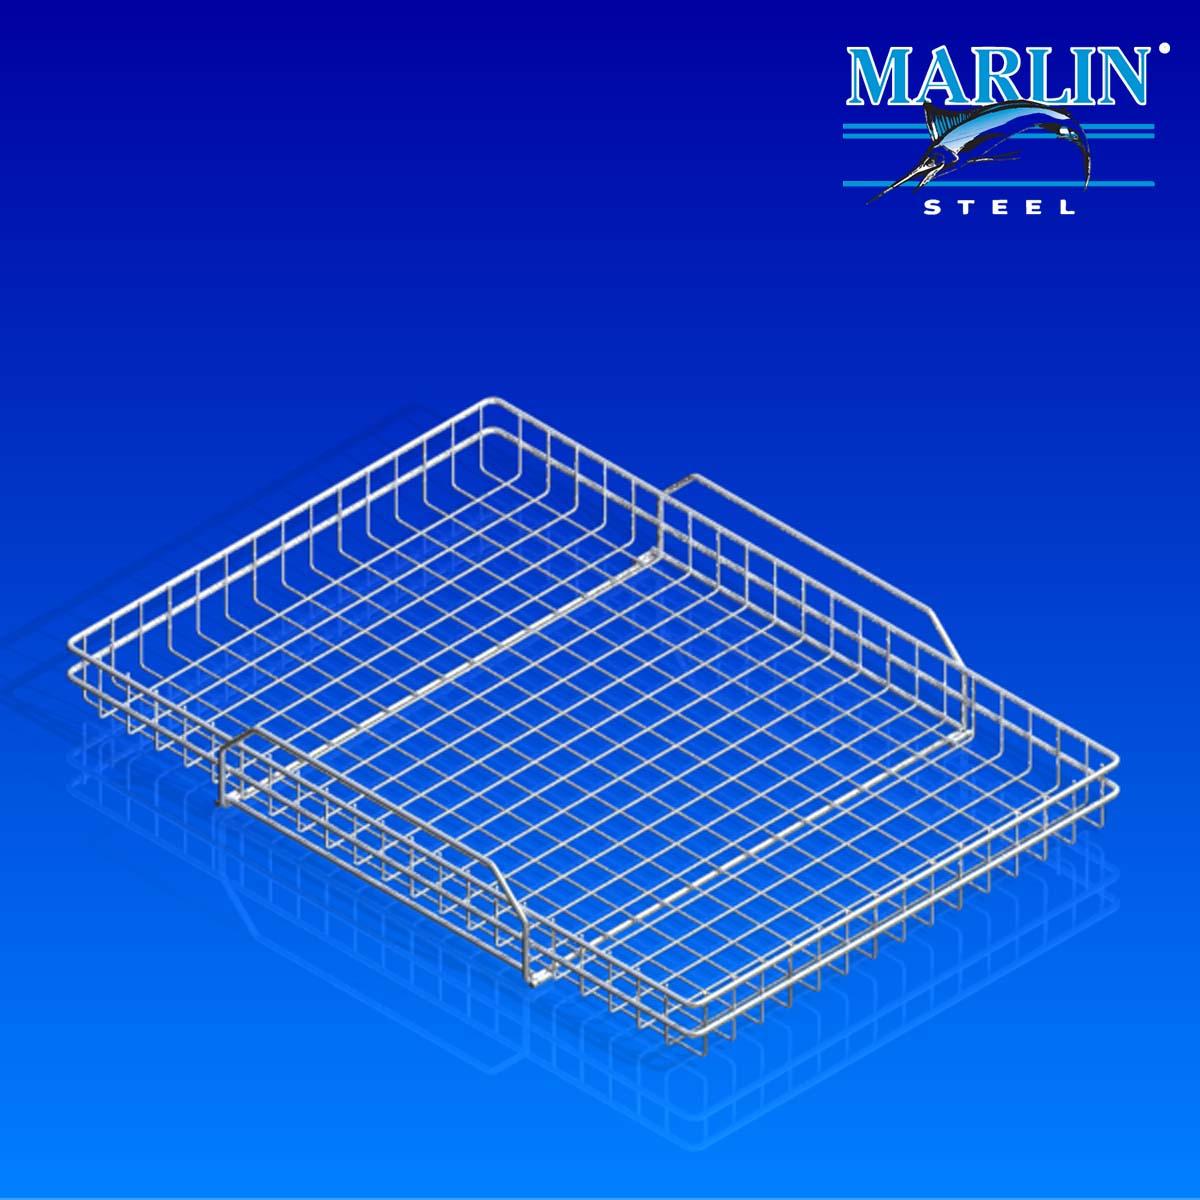 Marlin Steel Basket with Handles 869001